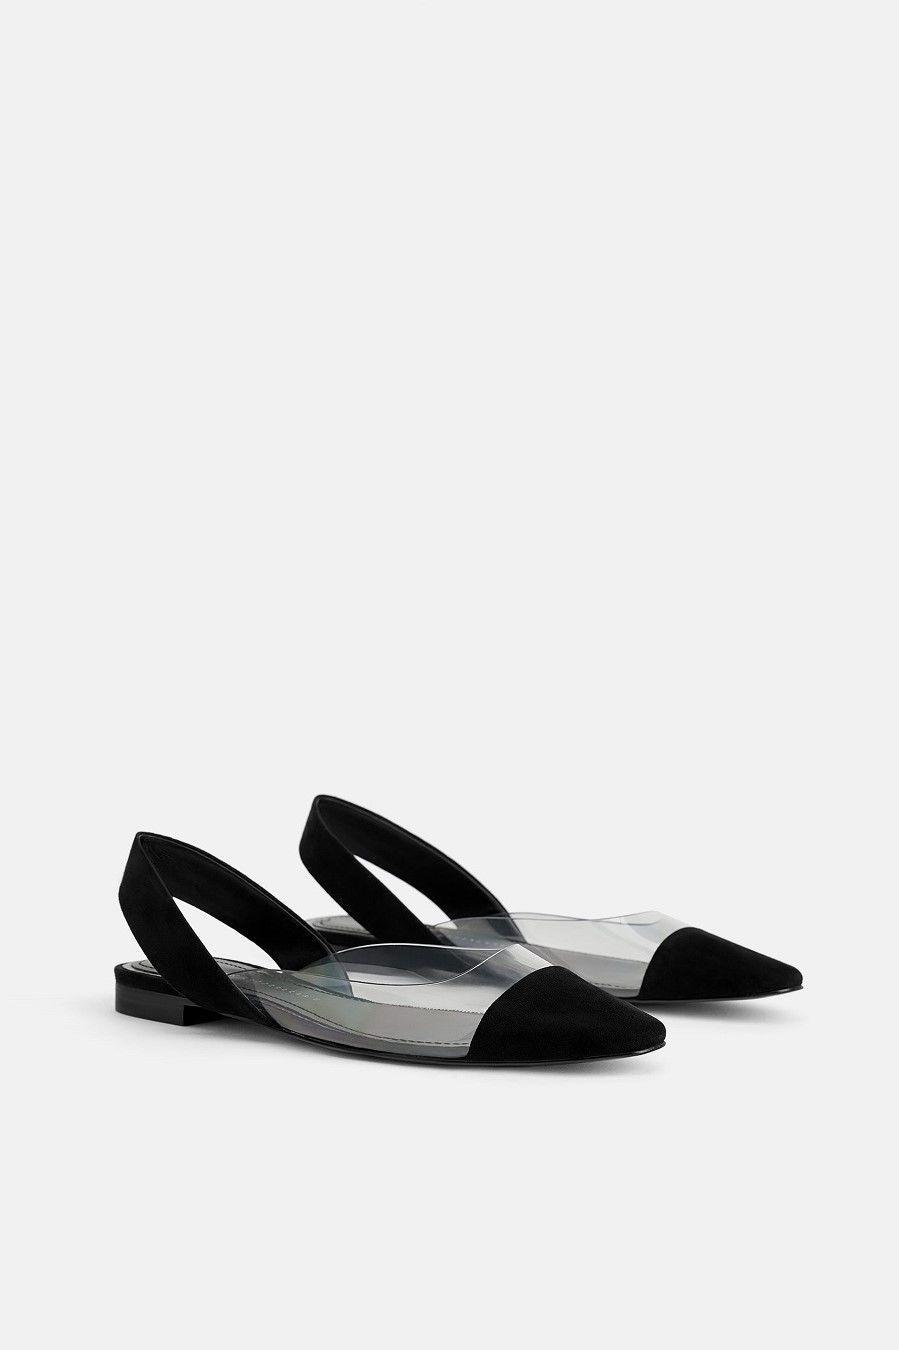 Deretan Flat Shoes Ini Dijamin Bikin Kamu Ingin Memakainya Setiap Hari